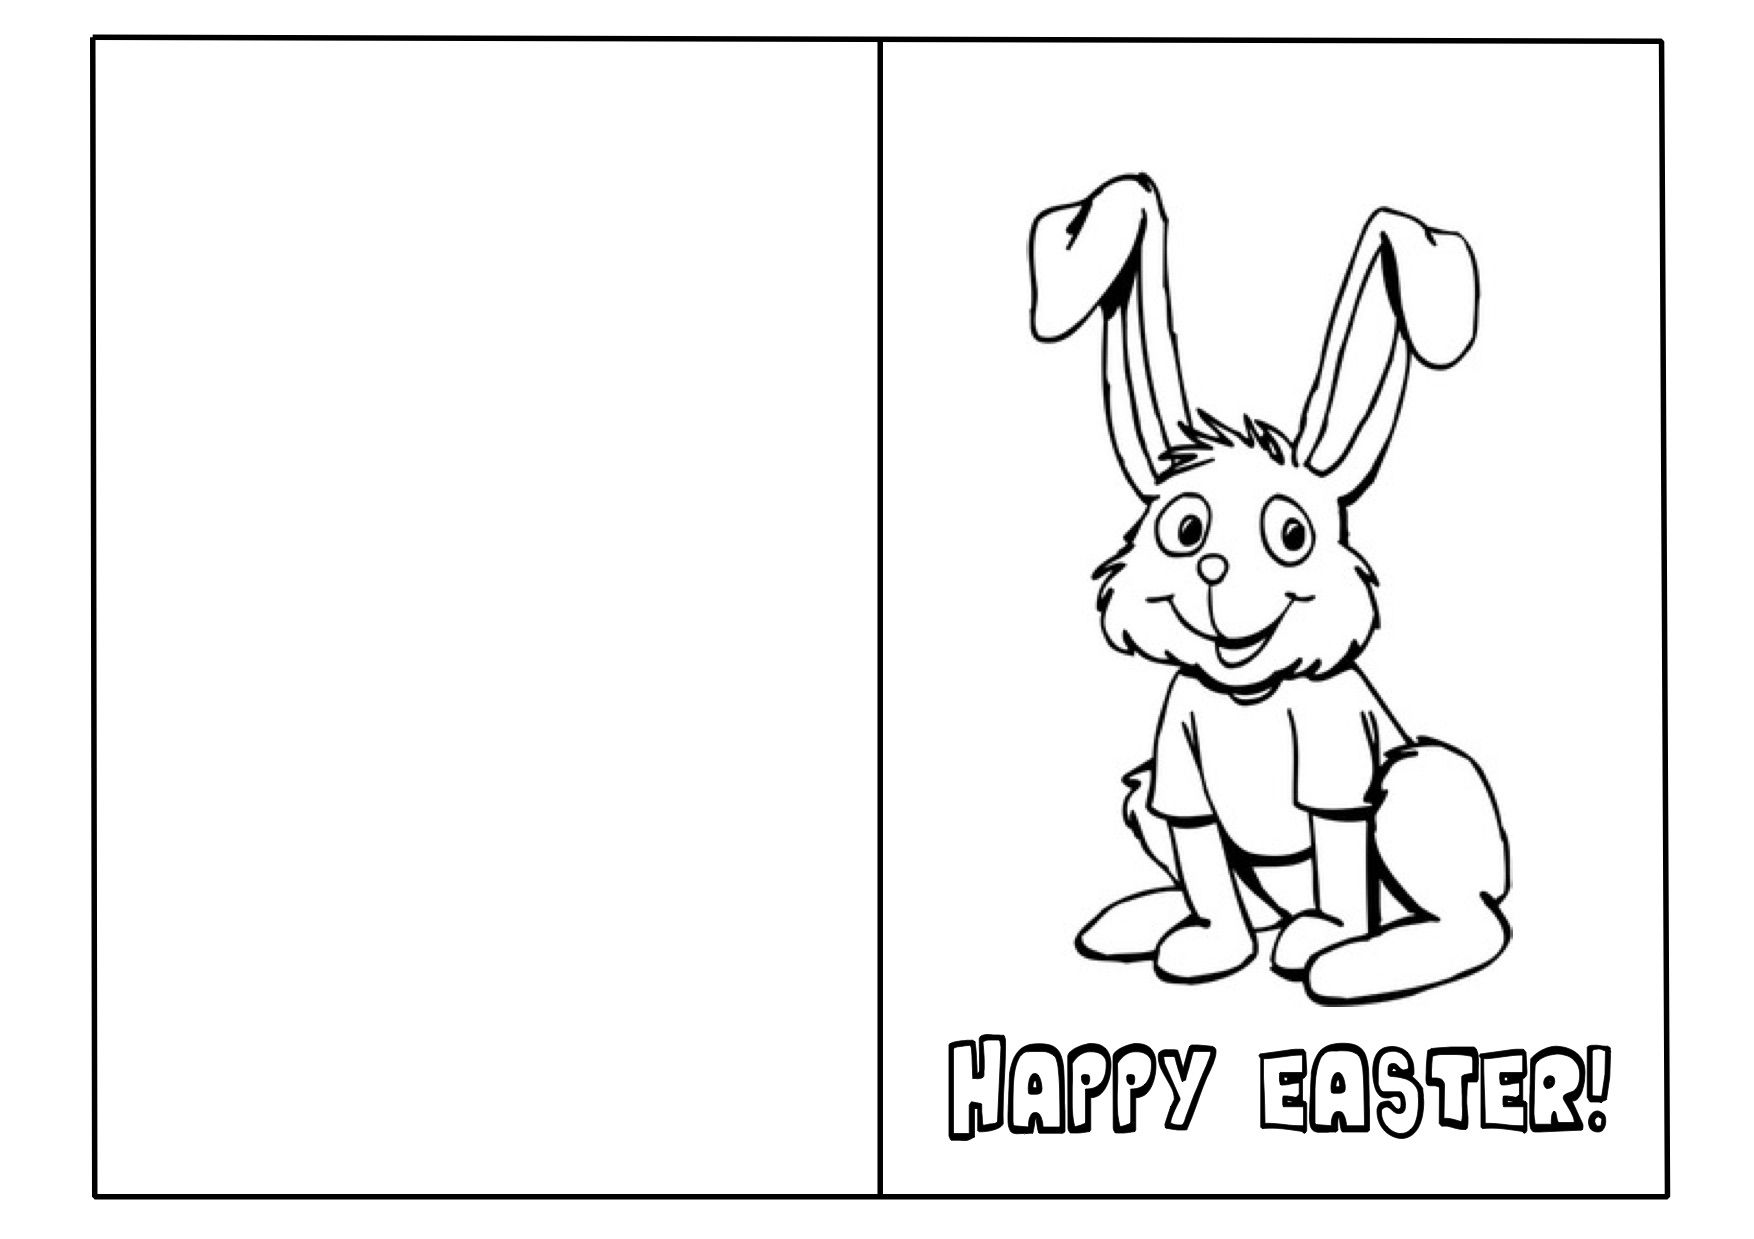 Easter Card Template Ks2 1 Happy Easter Sunday With Regard To Easter Card Template Ks2 Best Easter Cards Printable Happy Easter Sunday Christmas Cards Kids